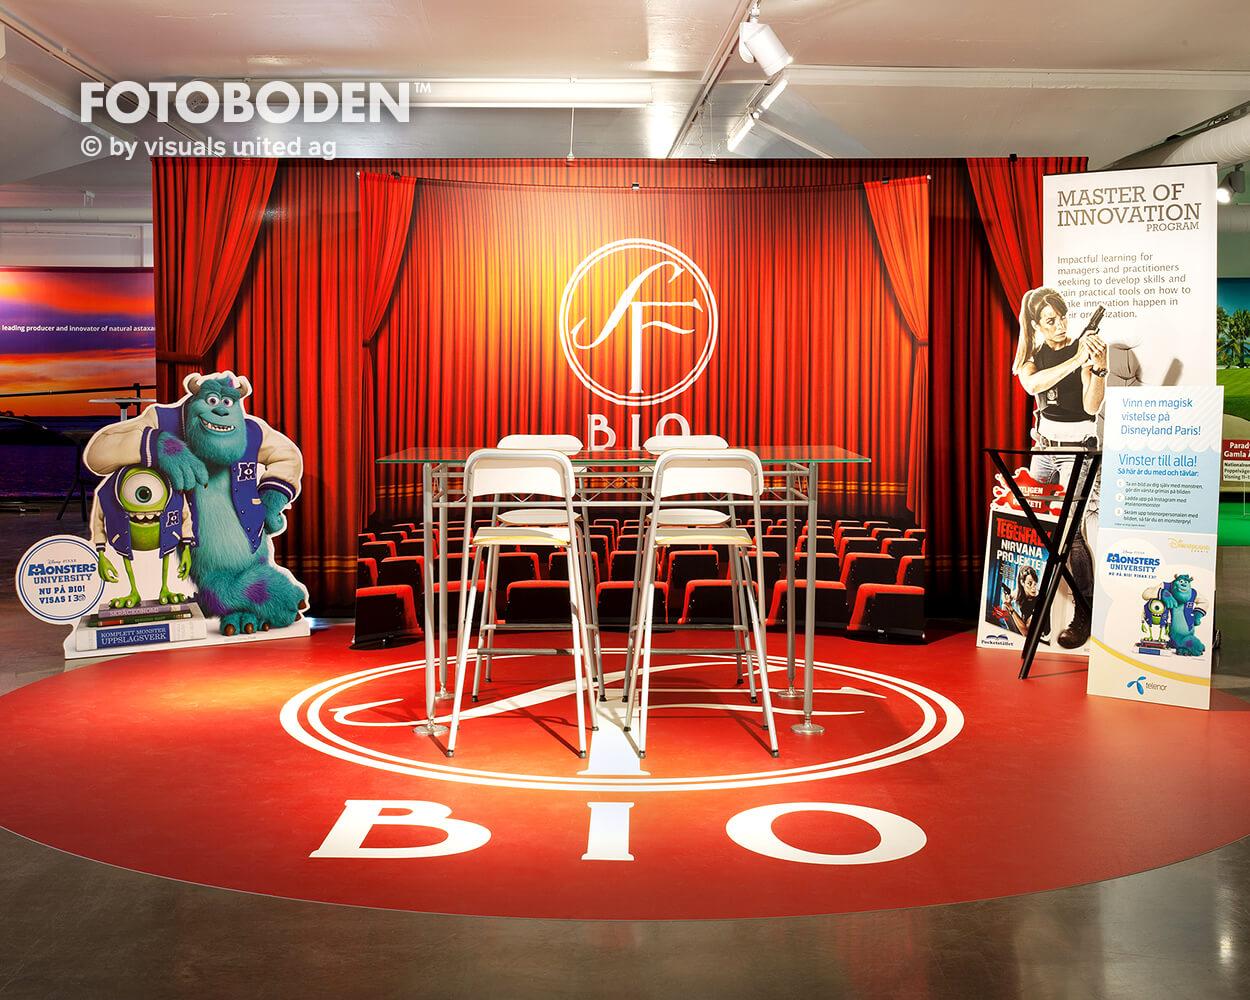 Bio Ladenbau Ladengestaltung Fußboden Verkaufsfläche Bodengestaltung Boden Foto Fotoboden Fotomotiv Motiv Druck Visual Merchandising Point Of Sale POS